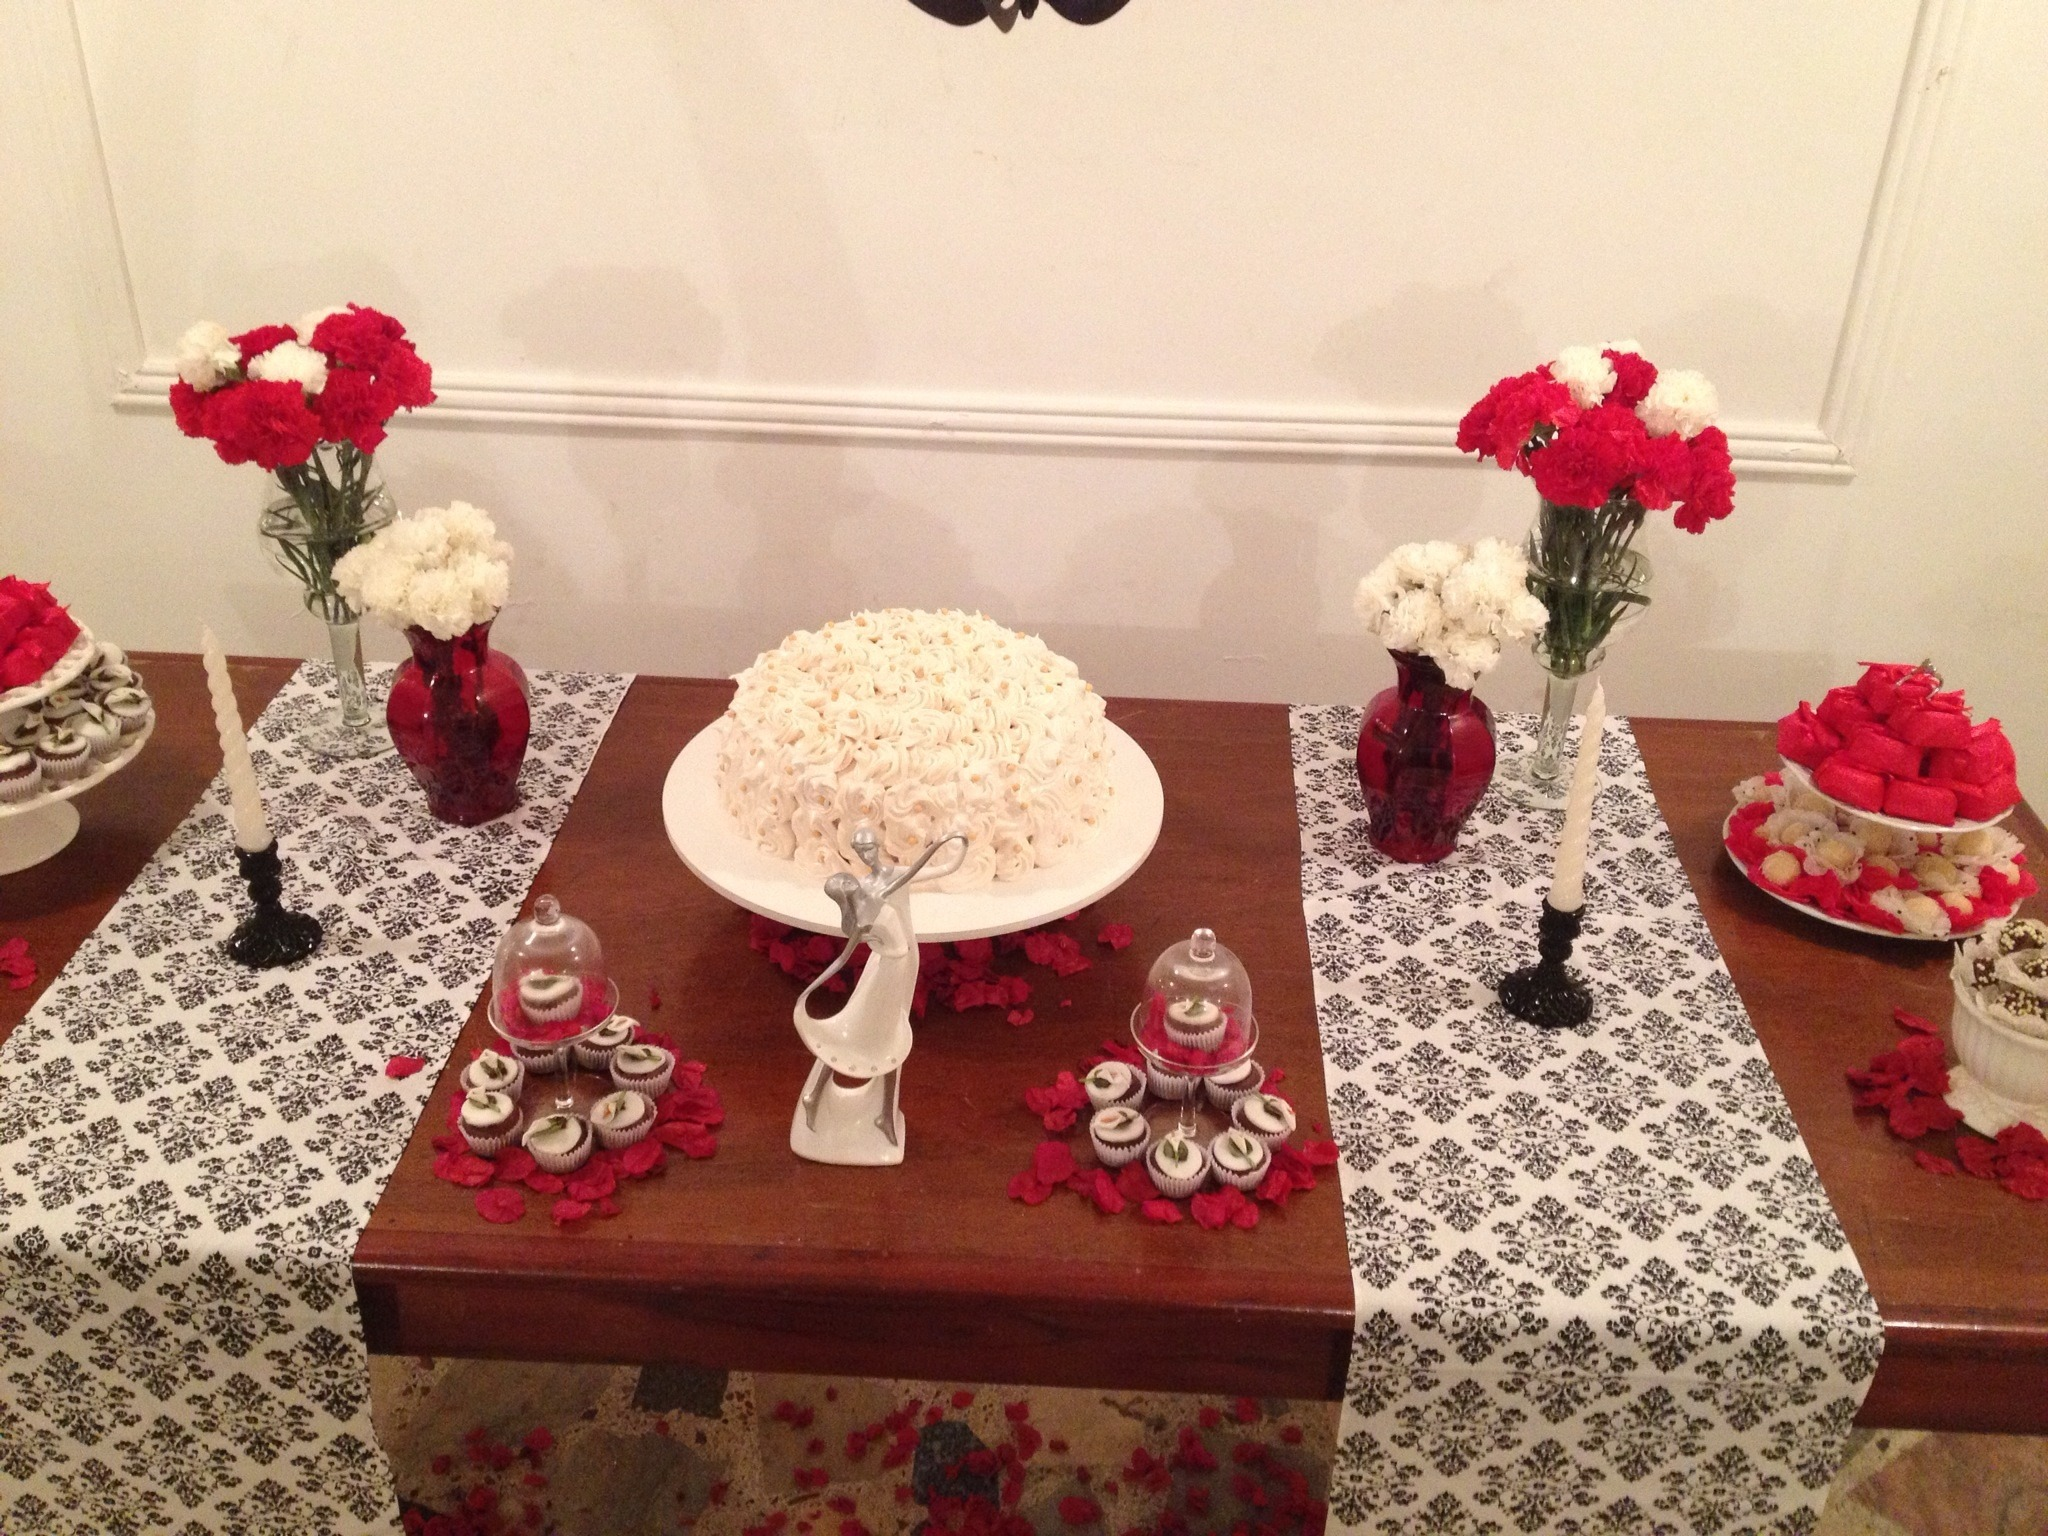 decoracao de boteco para noivado:decoracao noivado decoracao noivado decoracao noivado